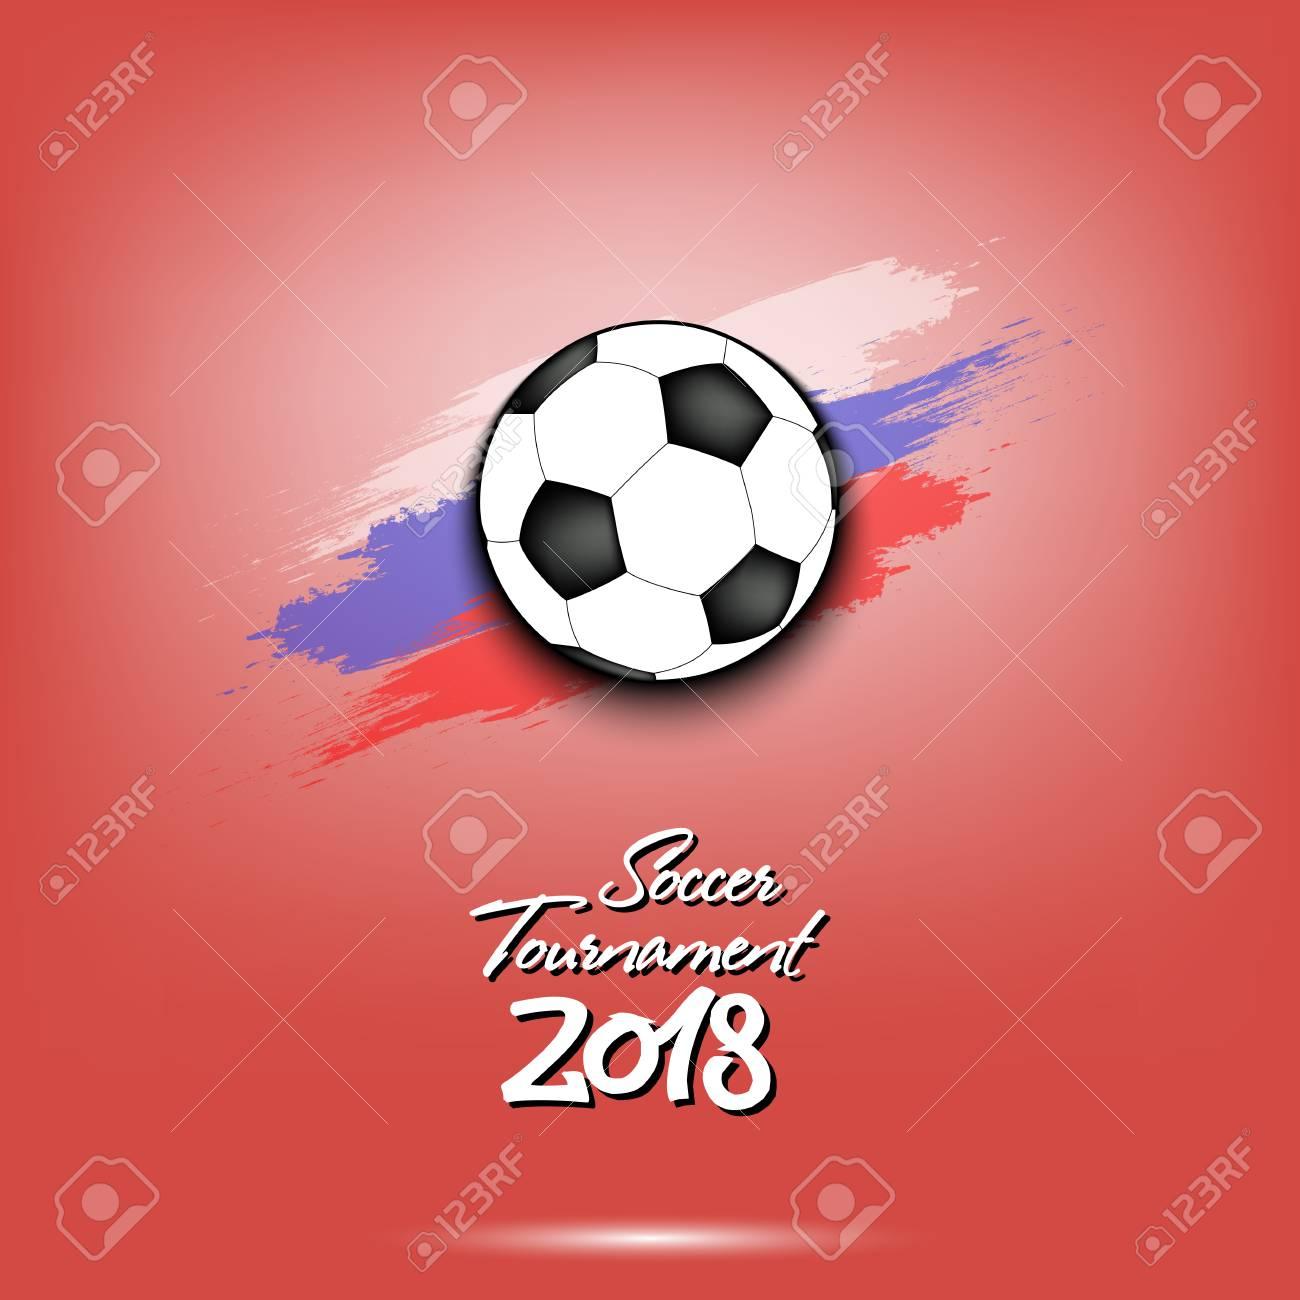 soccer tournament 2018 football logo template design vector